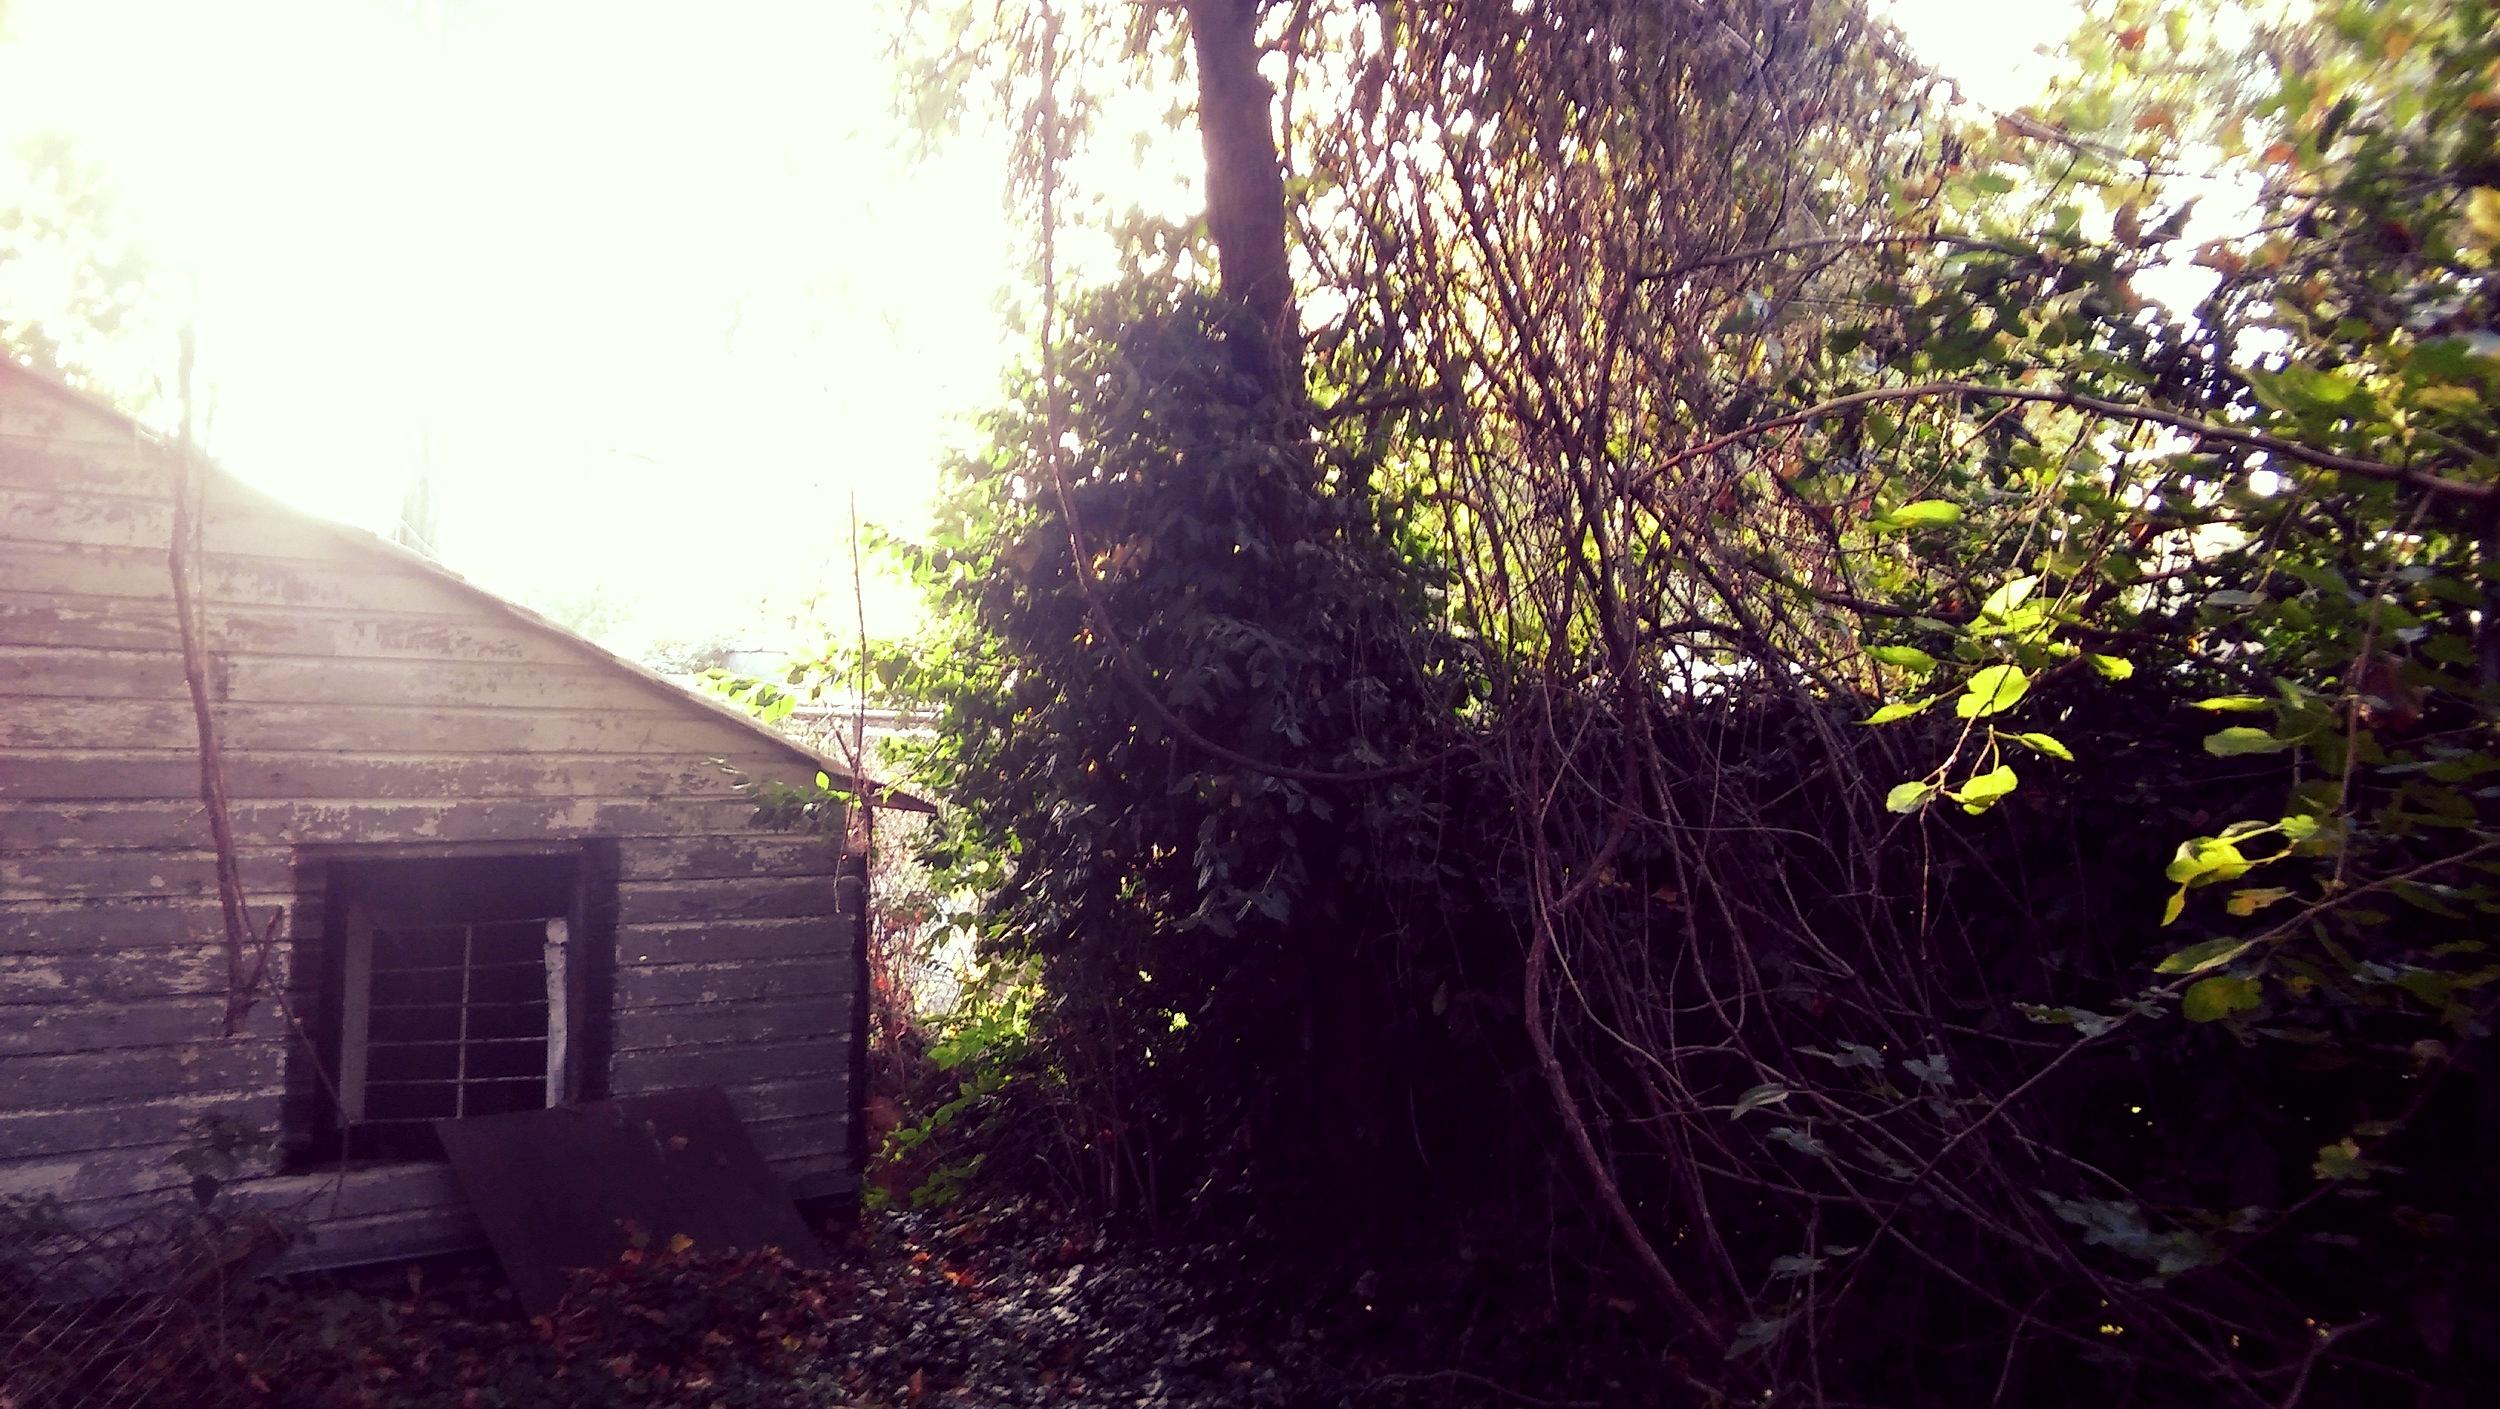 Backyard of 3650 California Before Renovation